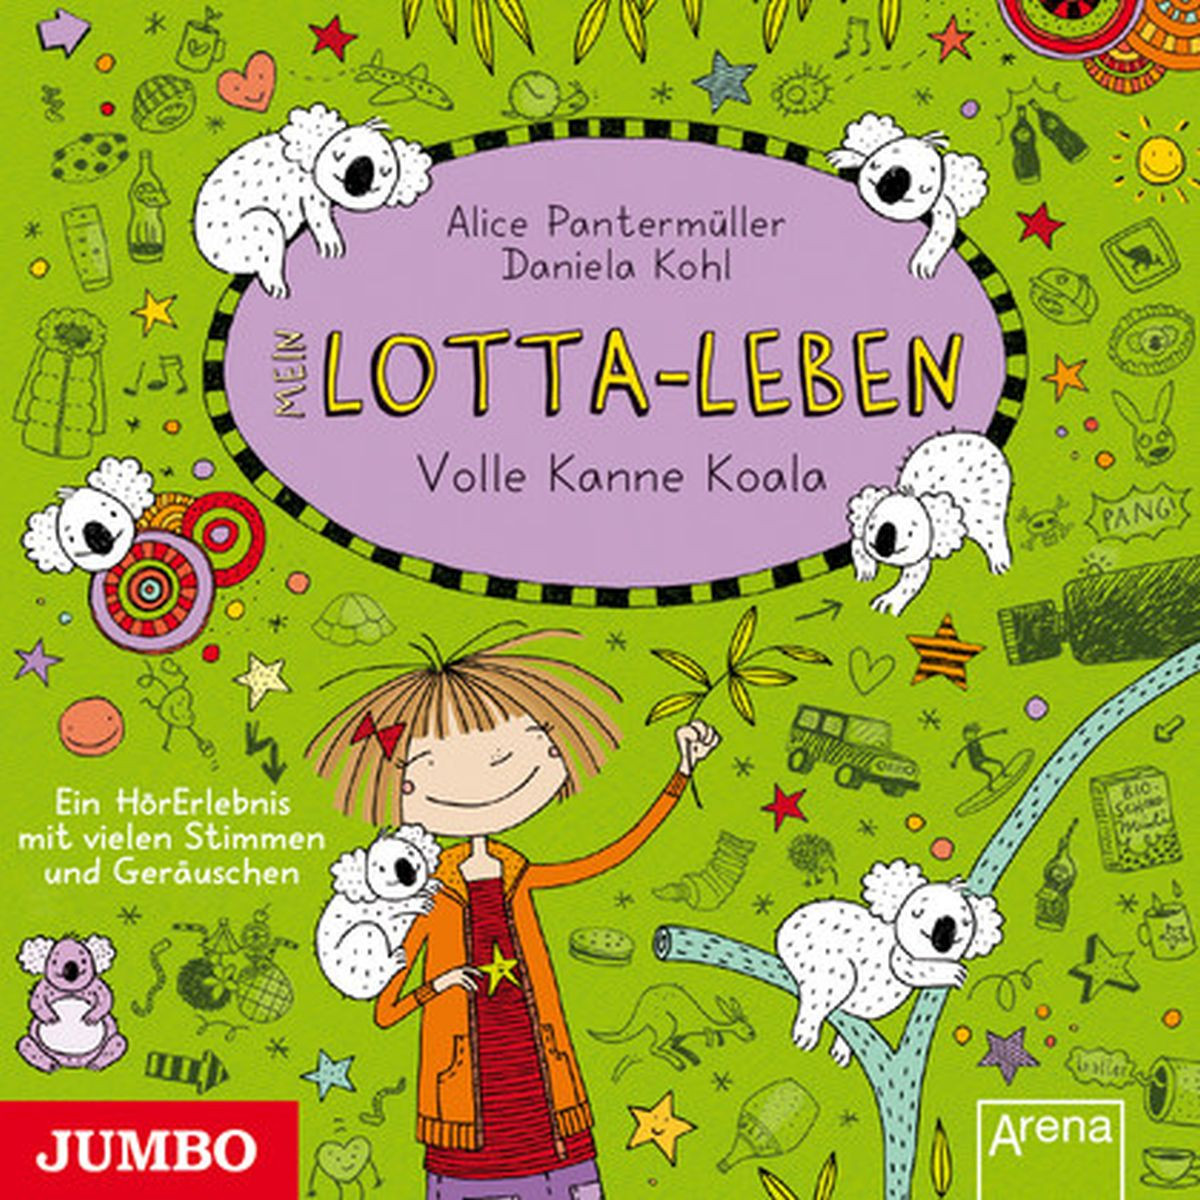 Mein Lotta-Leben (11) Volle Kanne Koala